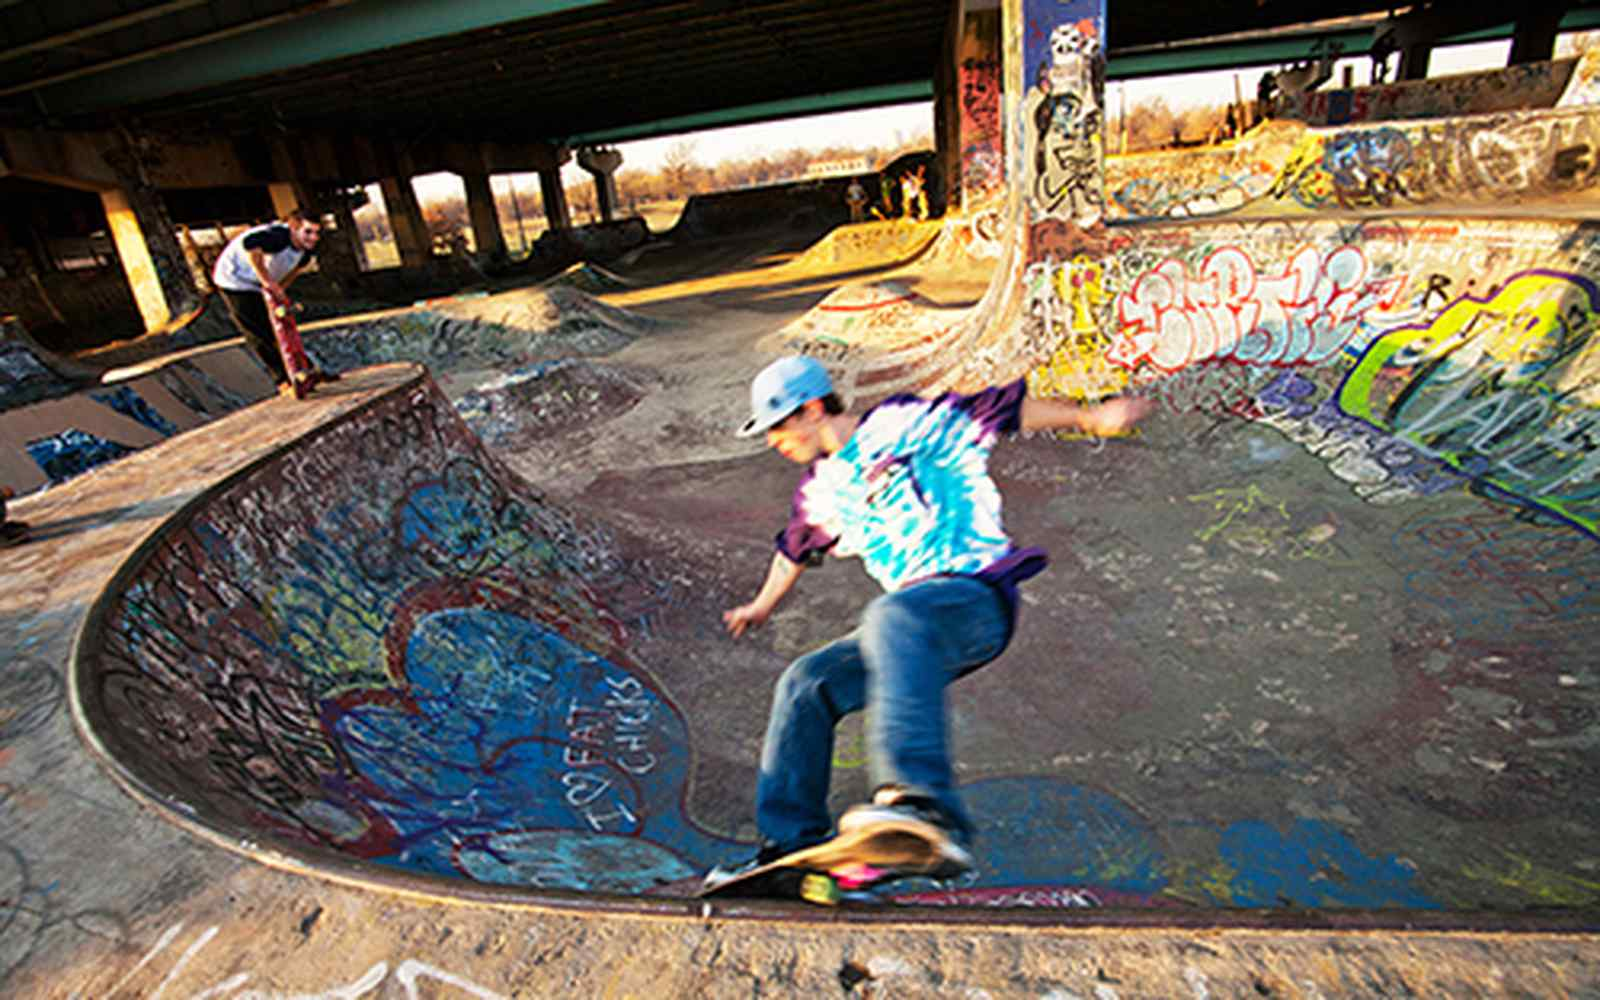 Skateboarders in Philadelphia's FDR Skatepark